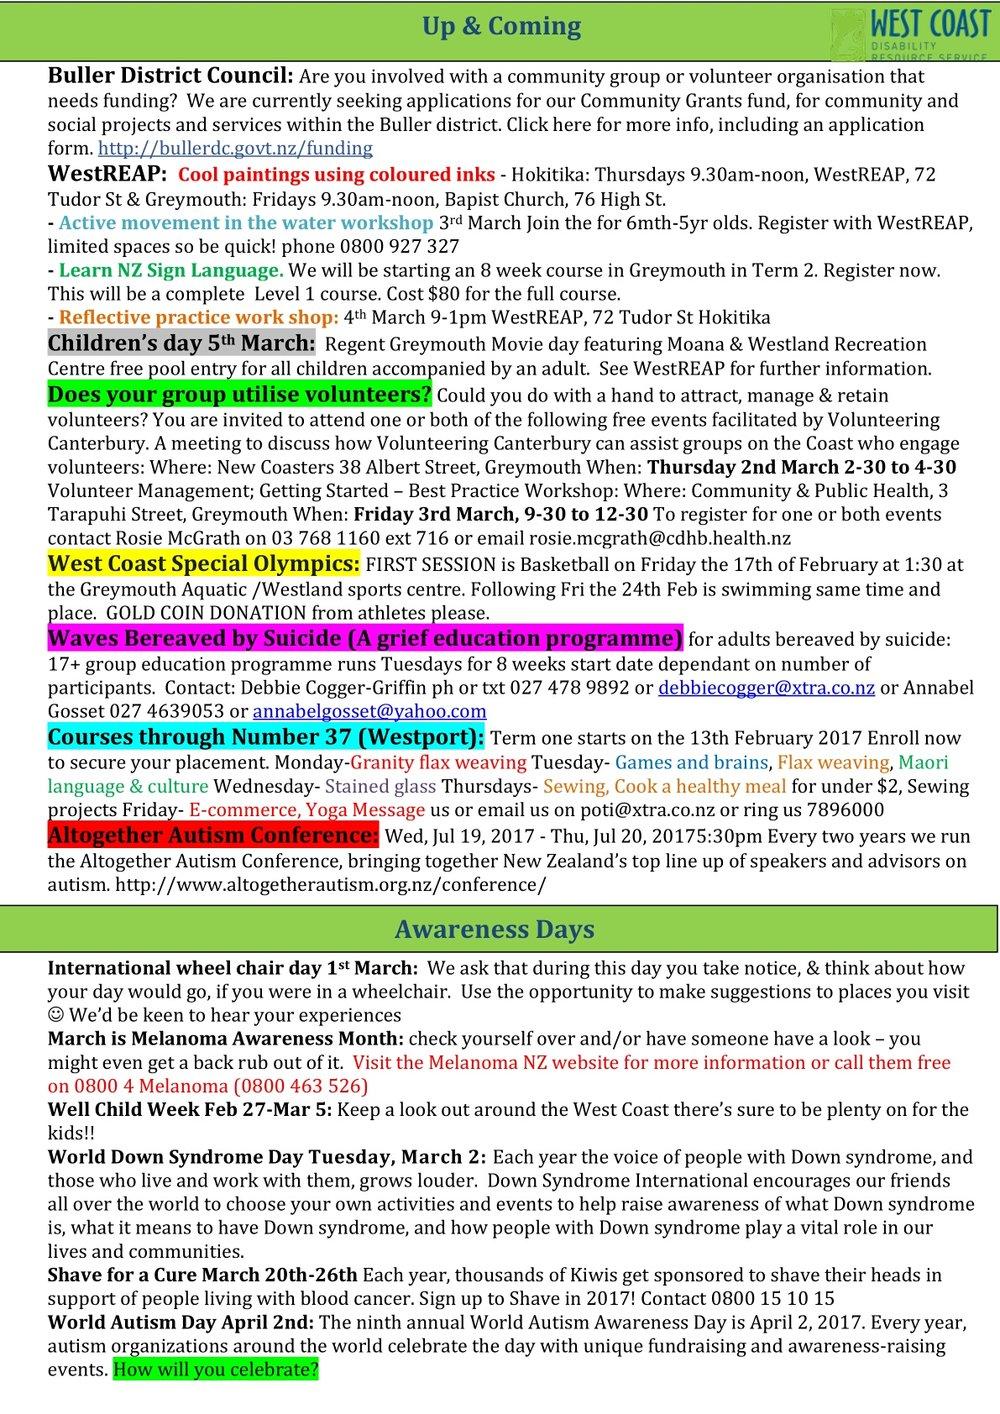 [2]WCDRS news letter 1.jpg